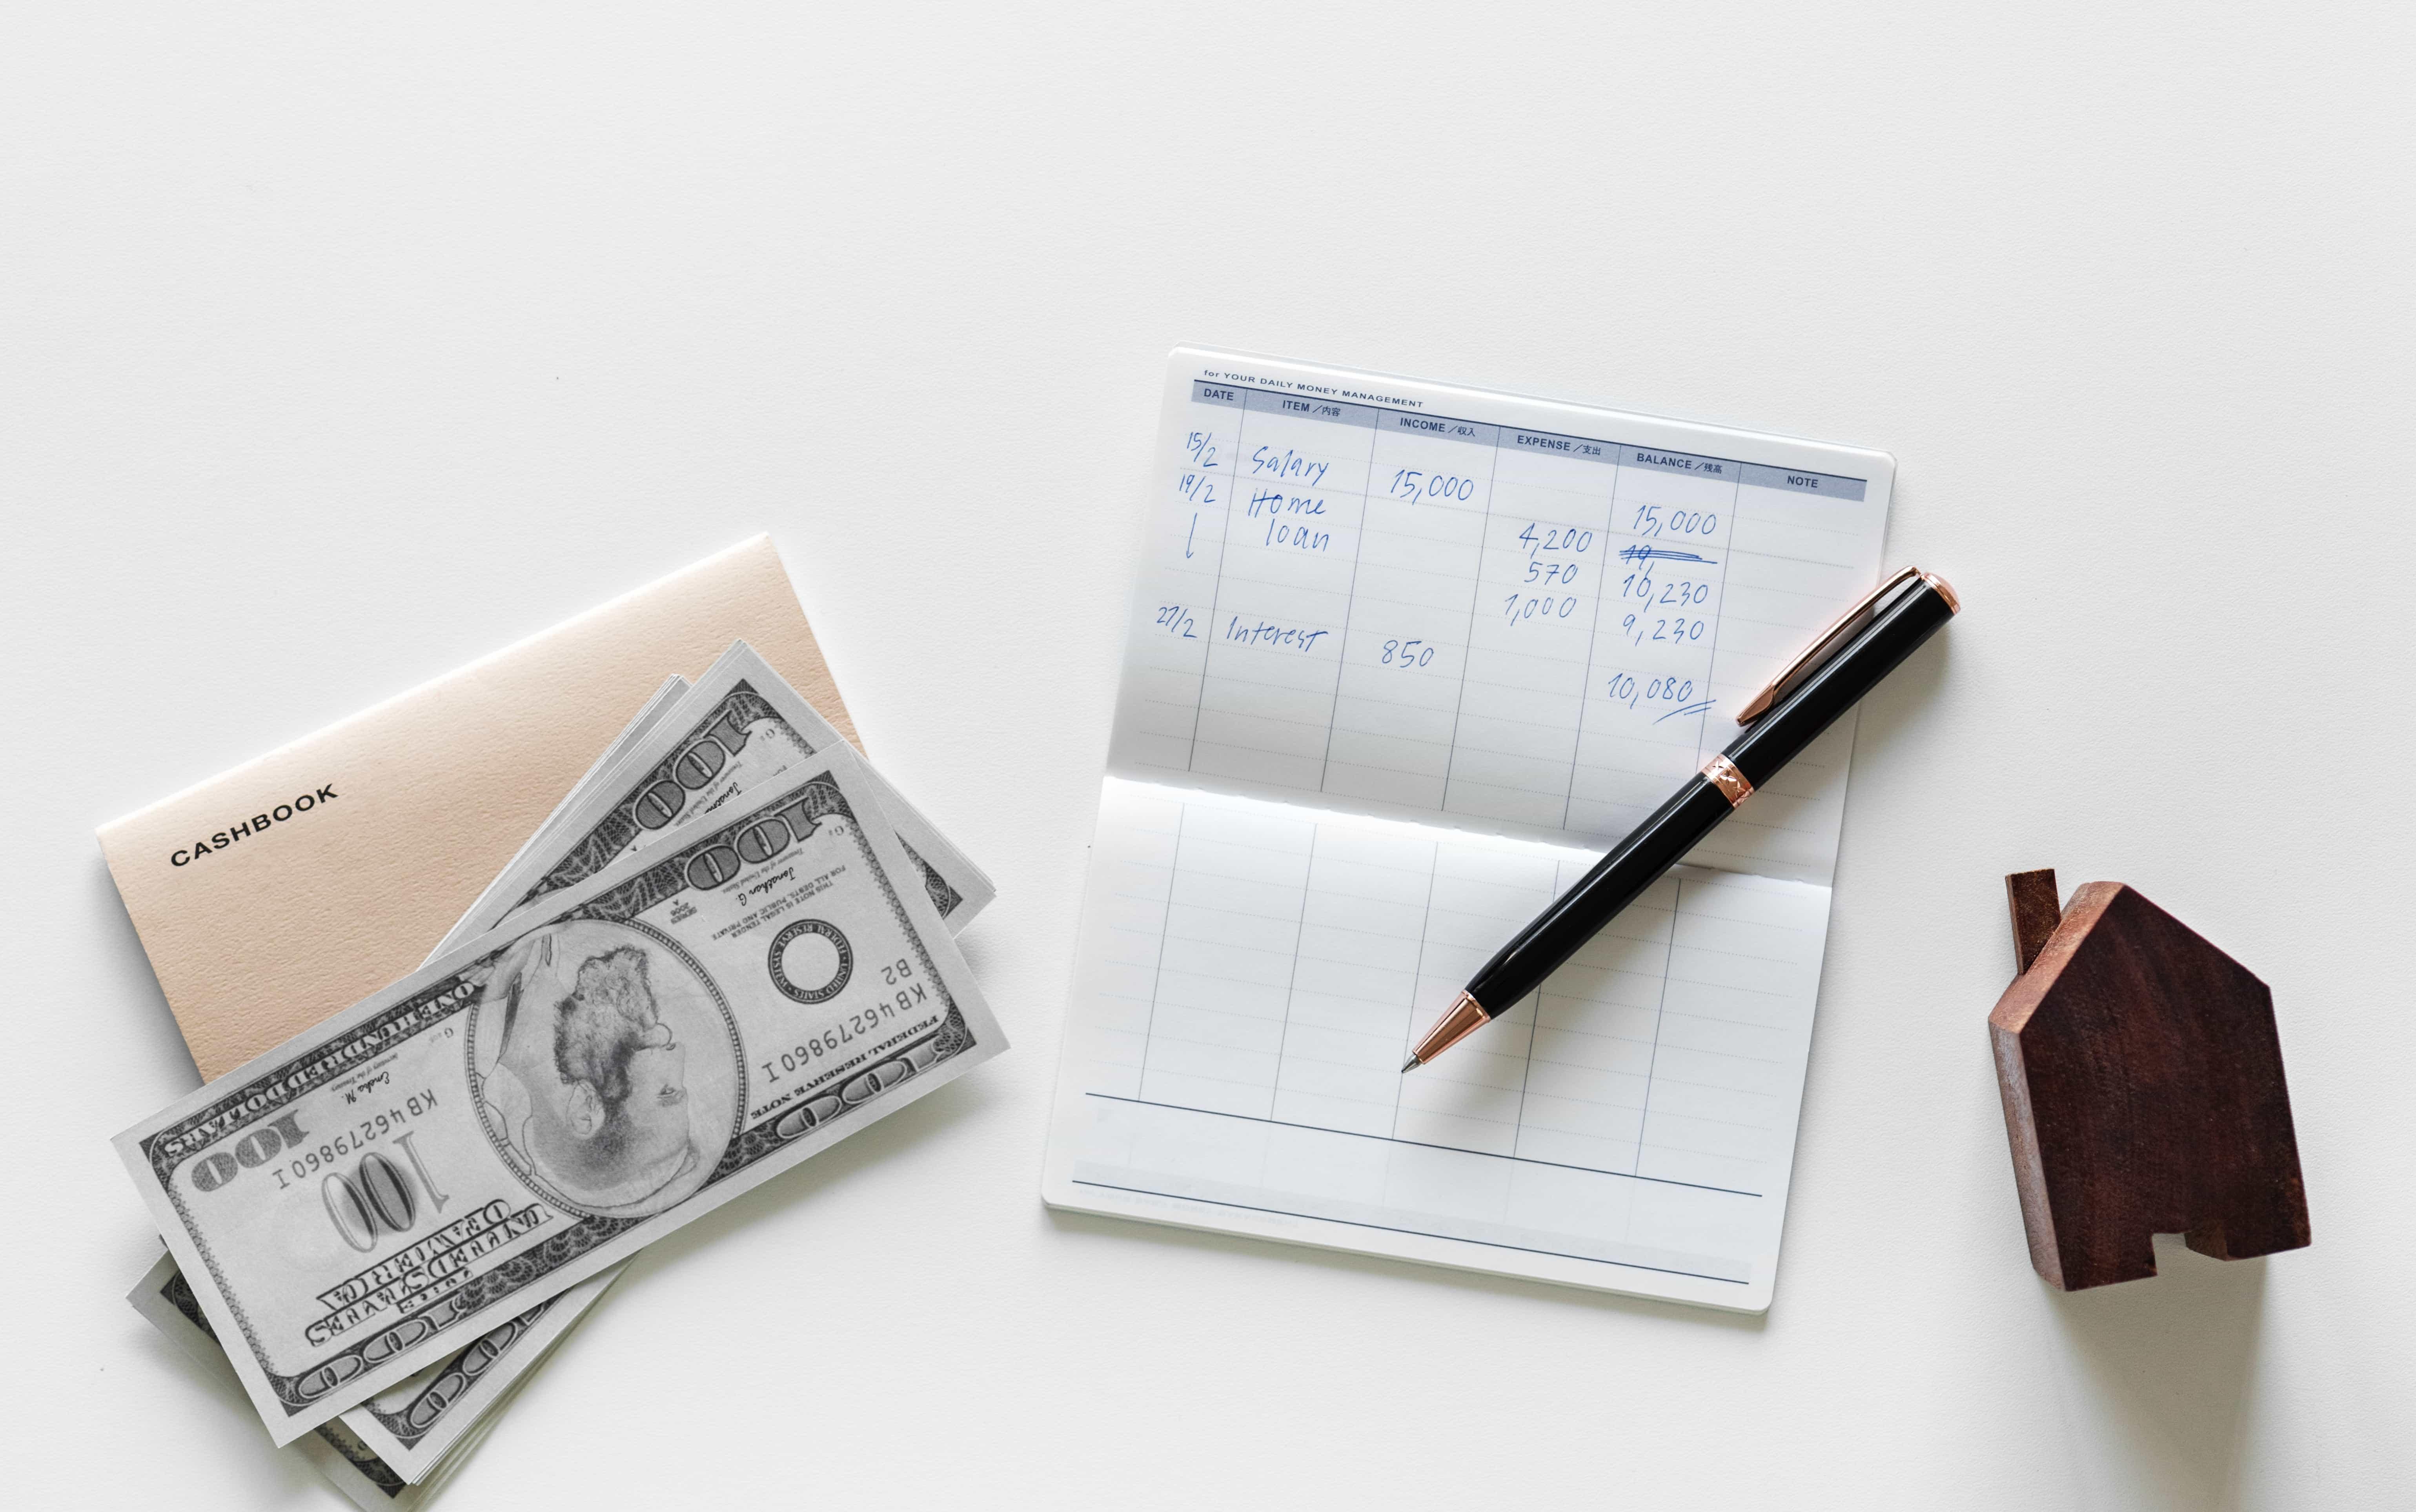 Maryland Guaranteed Payment Bond